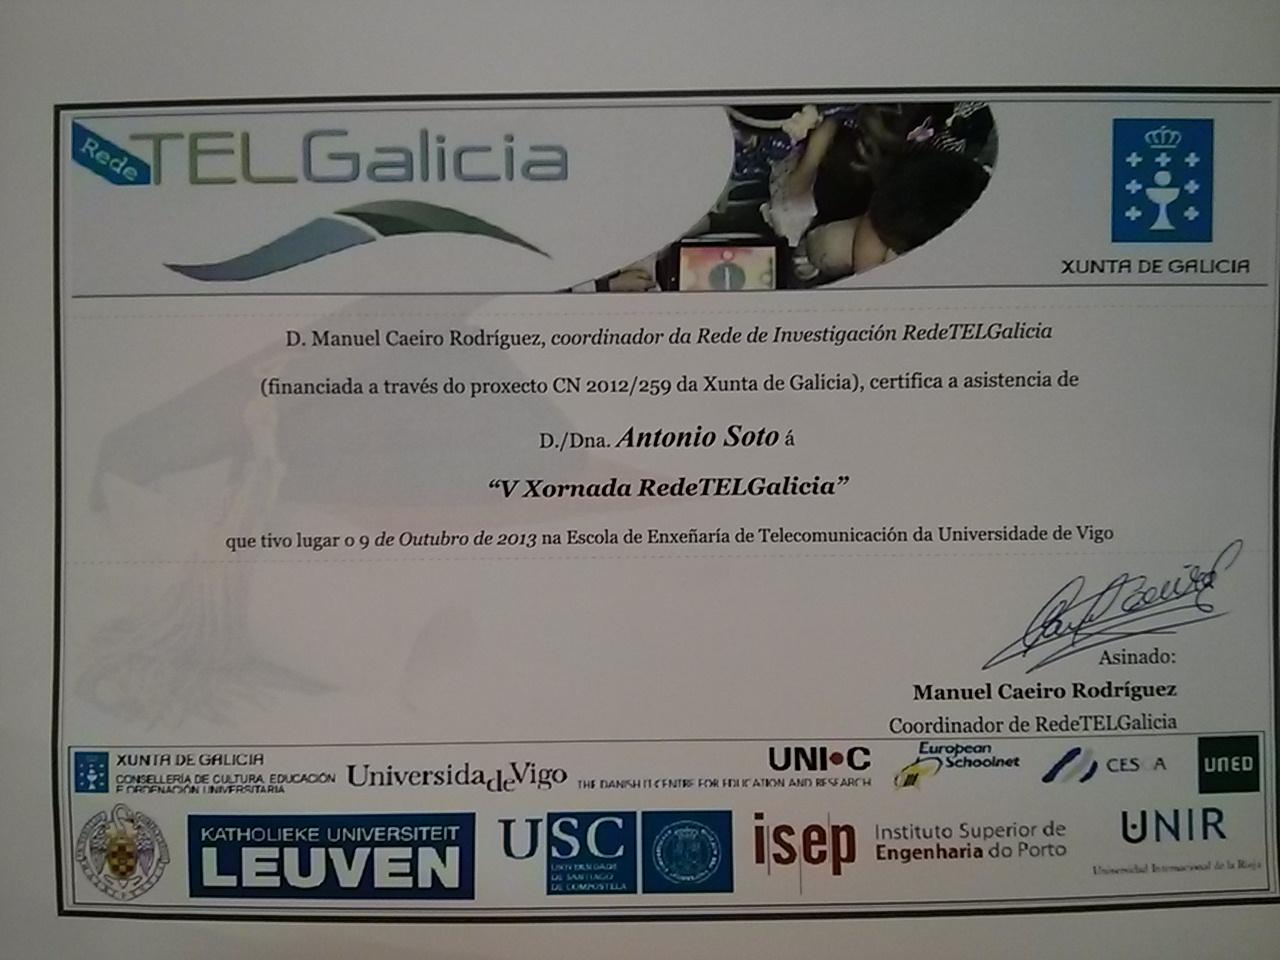 RedeTELgalicia_V_Jornada_certificado_asistencia